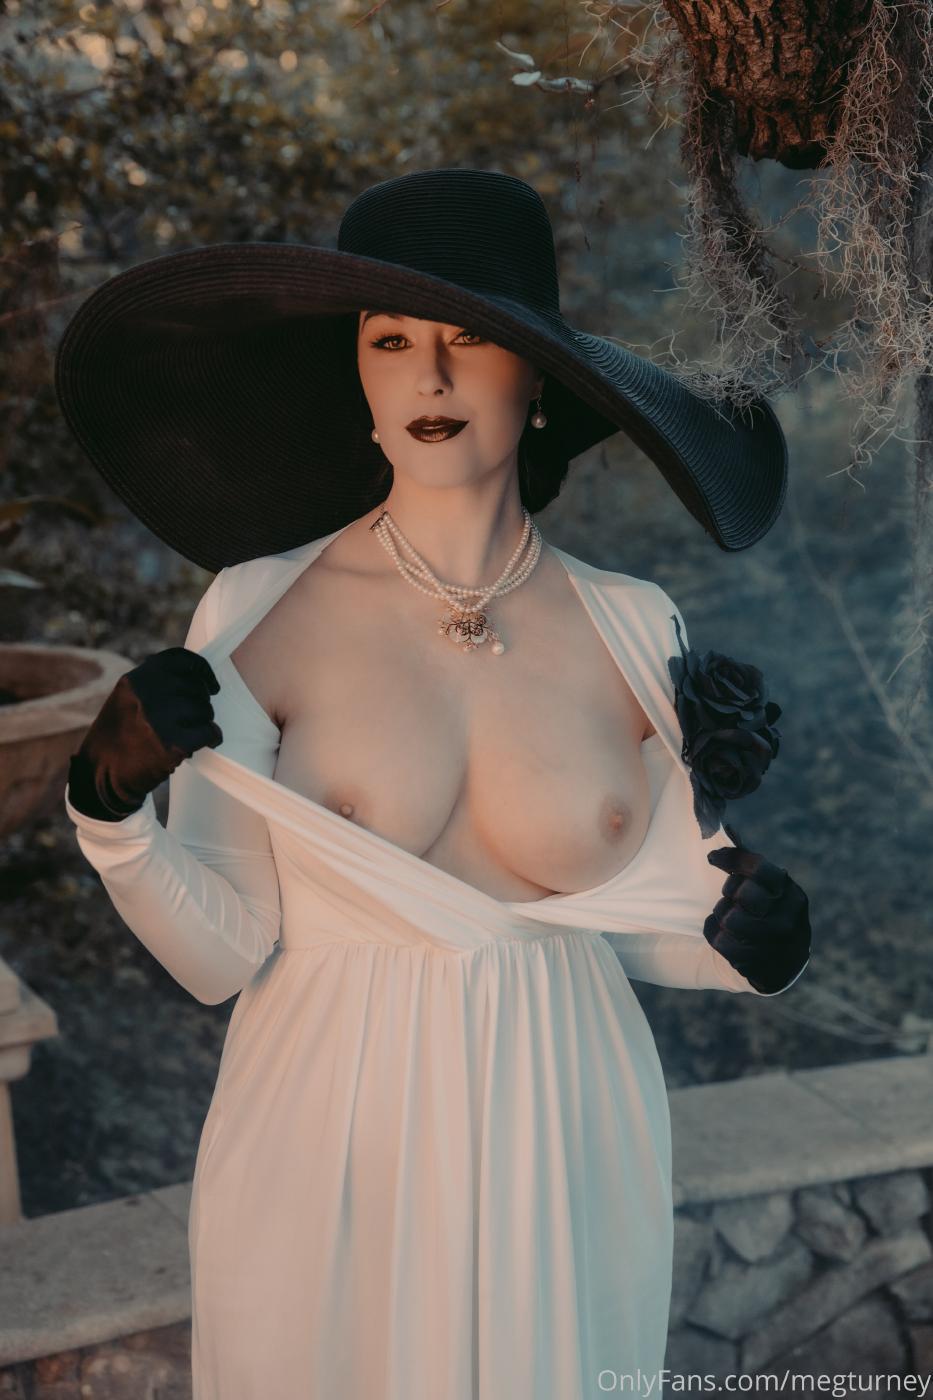 Meg Turney Lady Dimitrescu Cosplay Onlyfans Set Leaked 0004